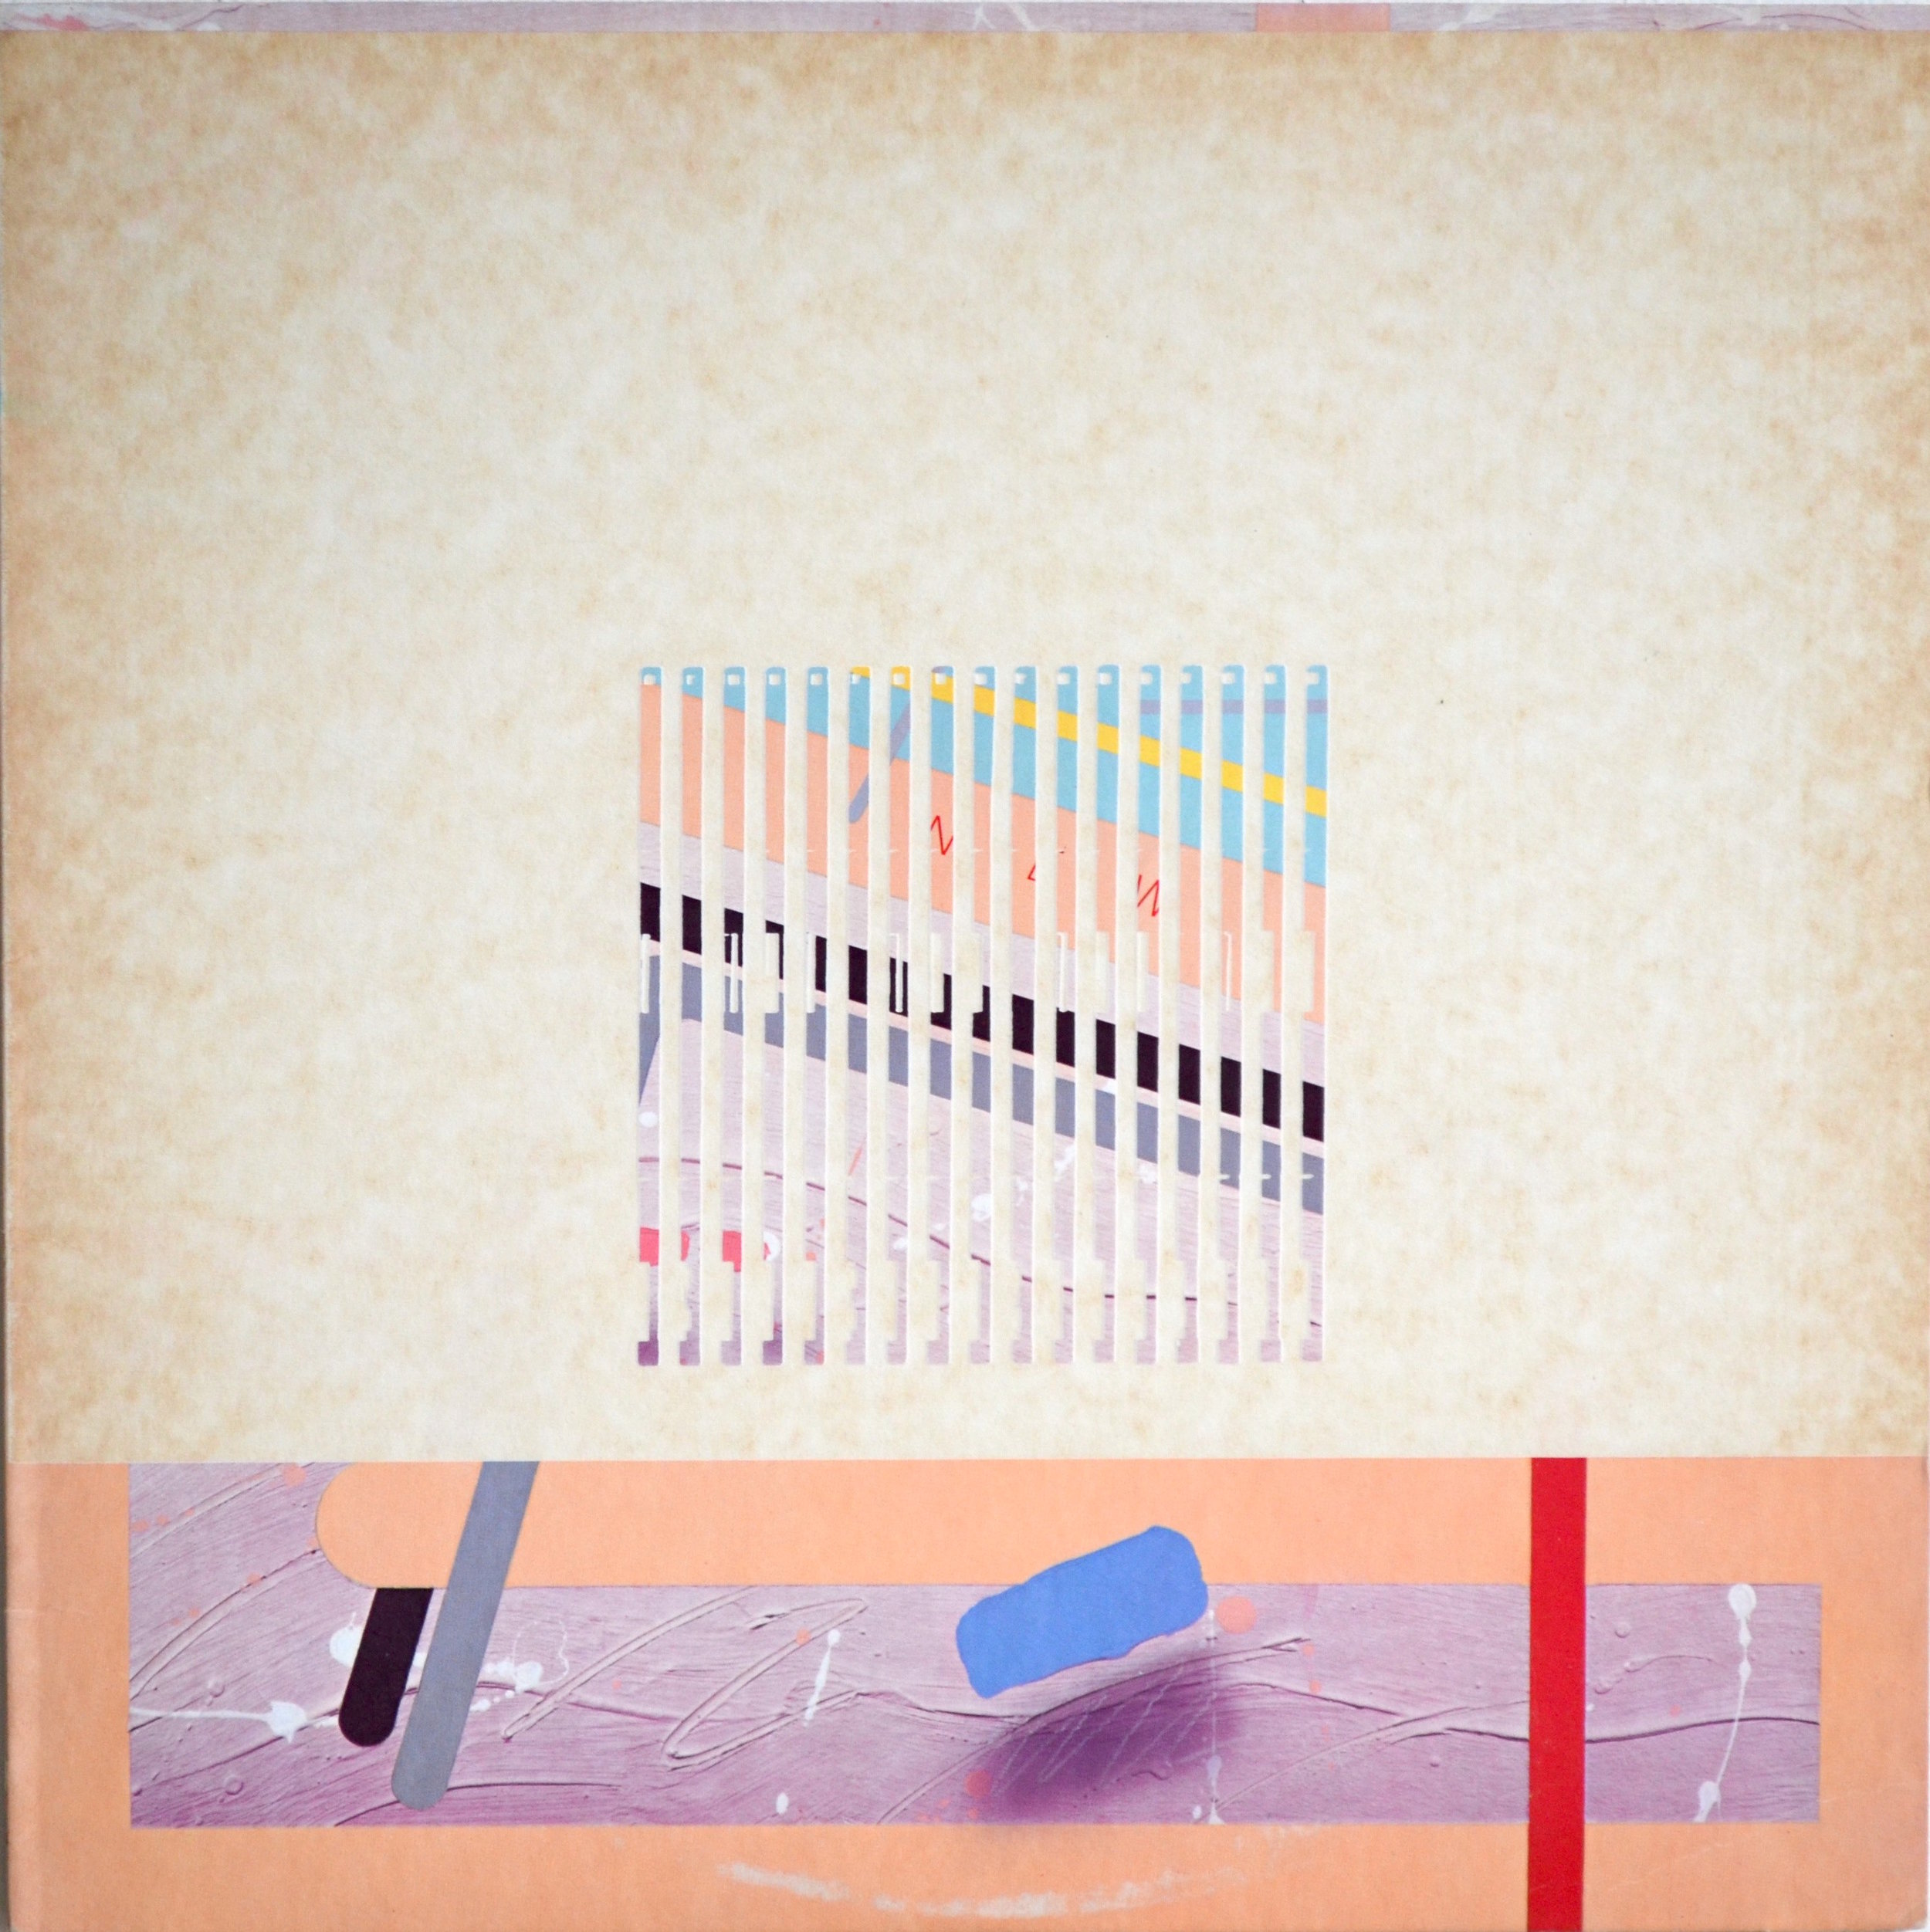 Erased record cover